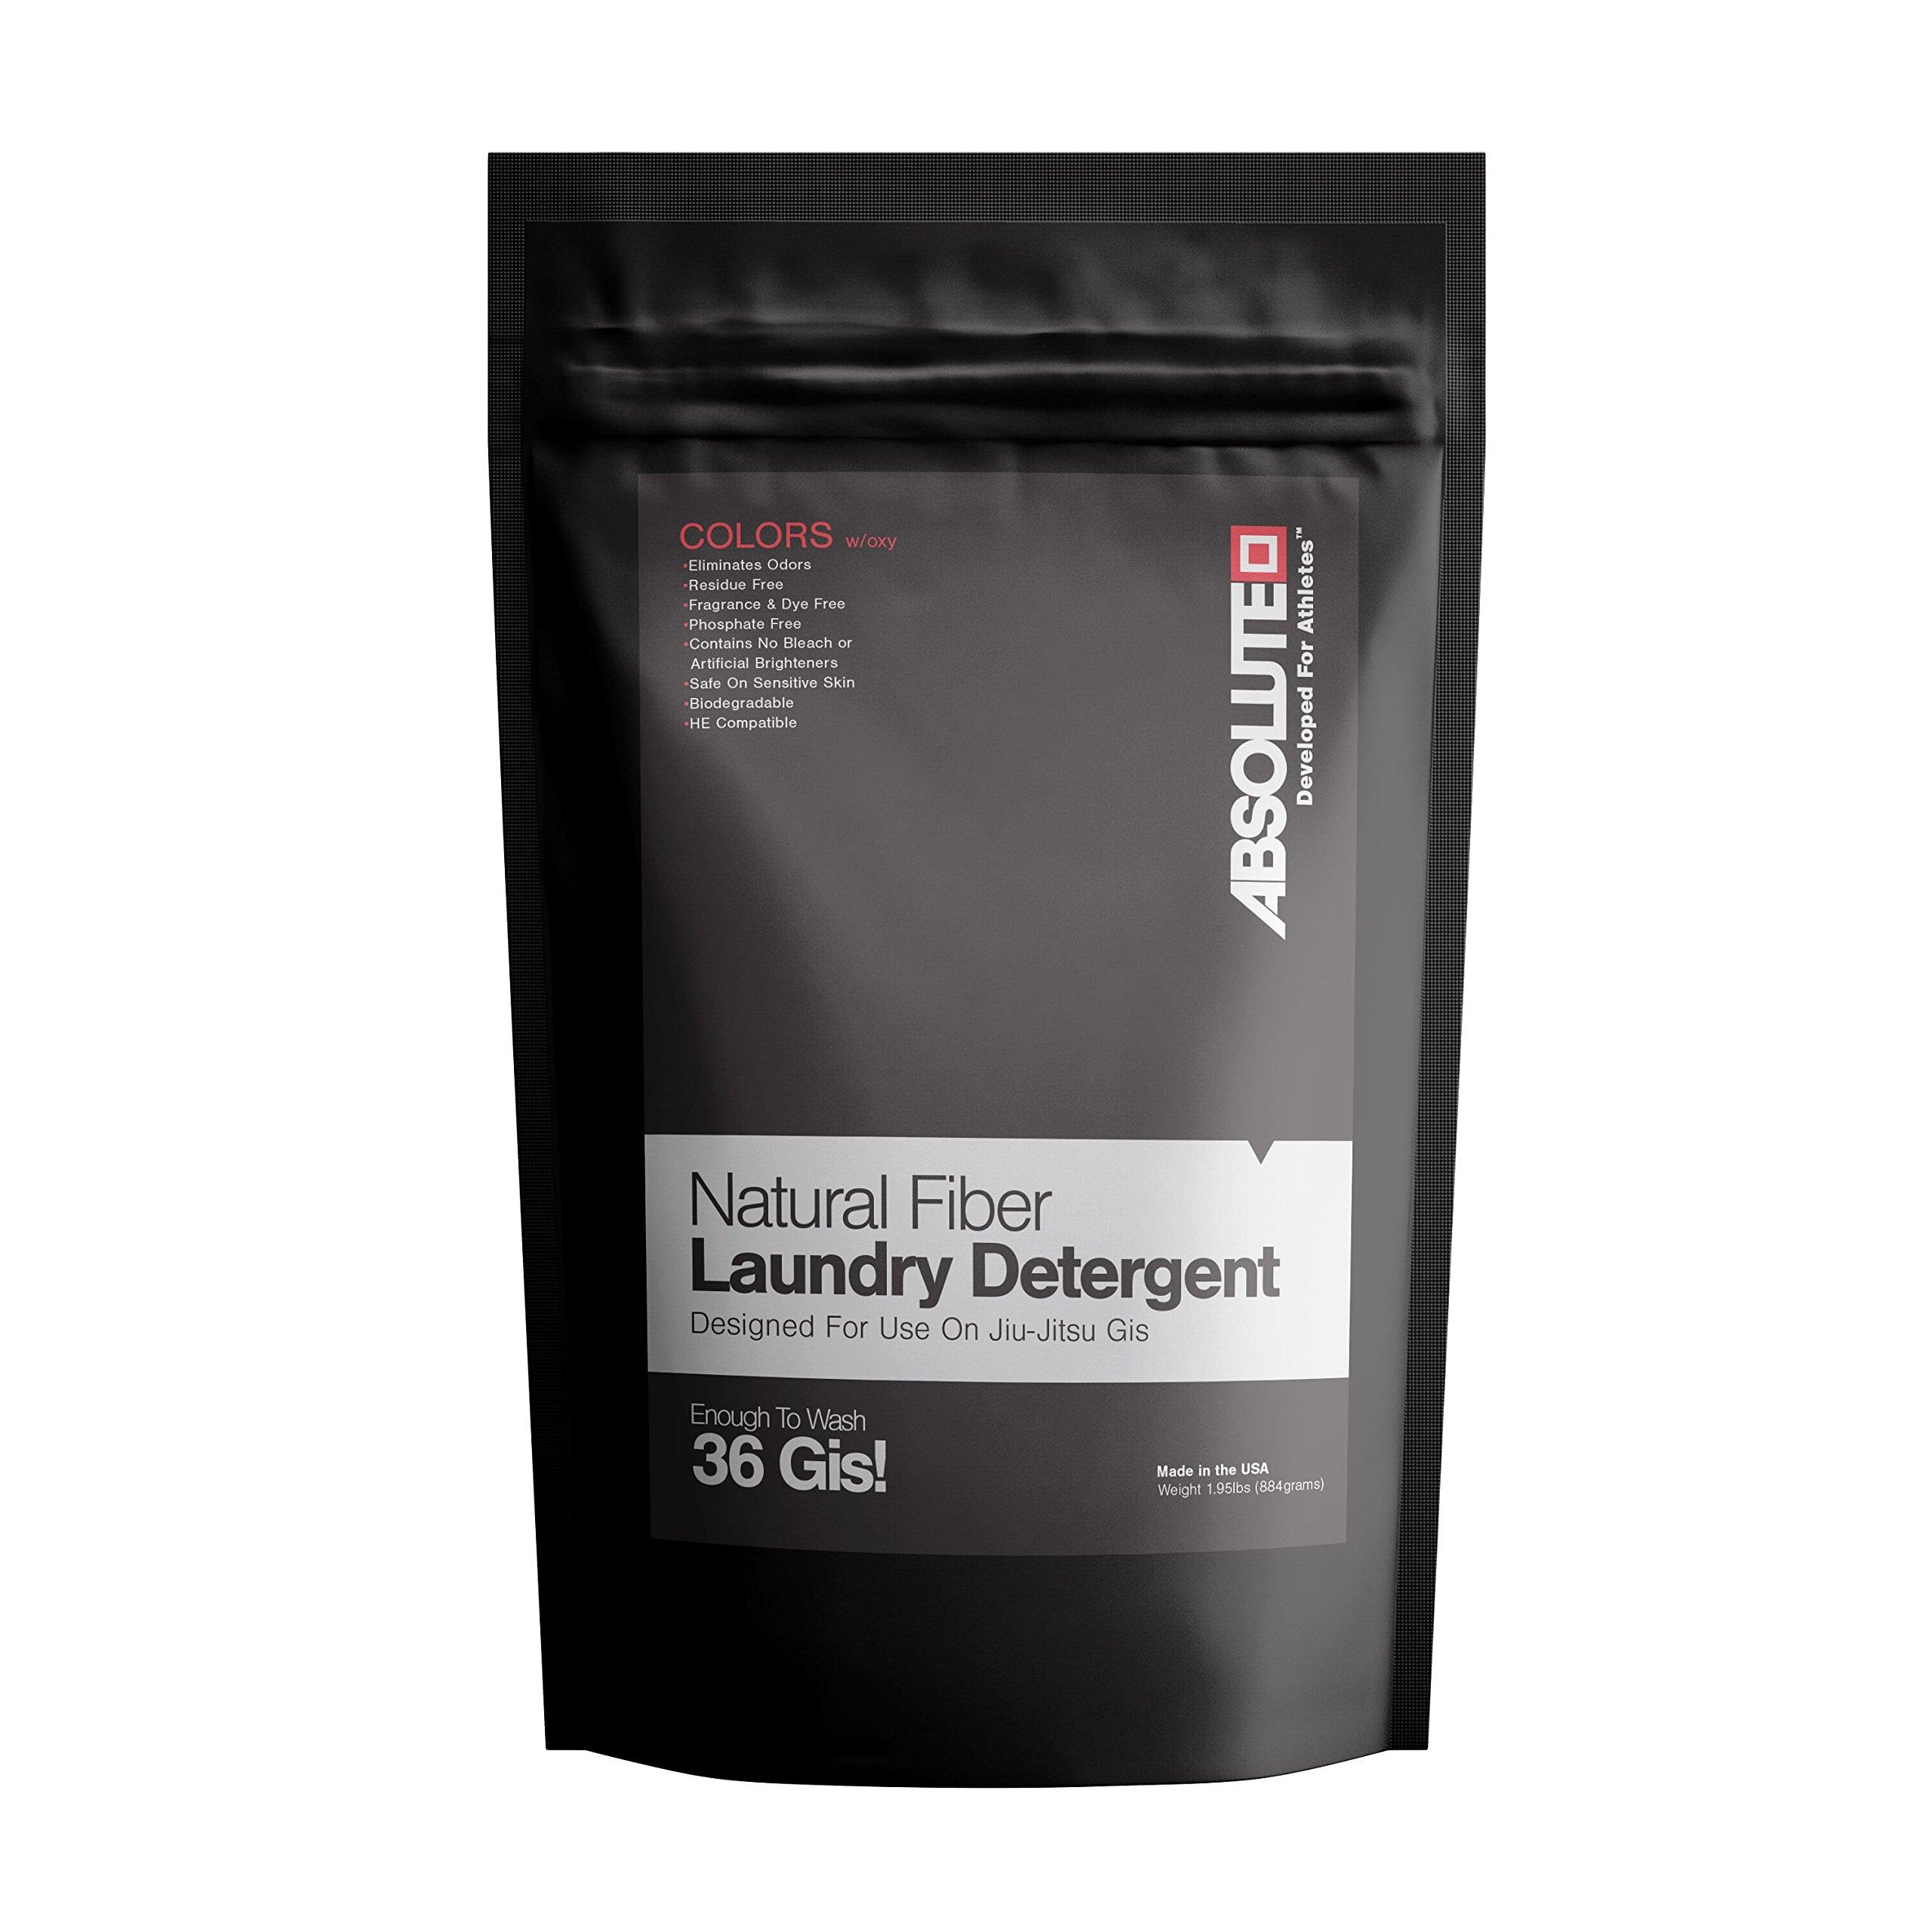 Absolute Natural Fiber Laundry Detergent - Colors